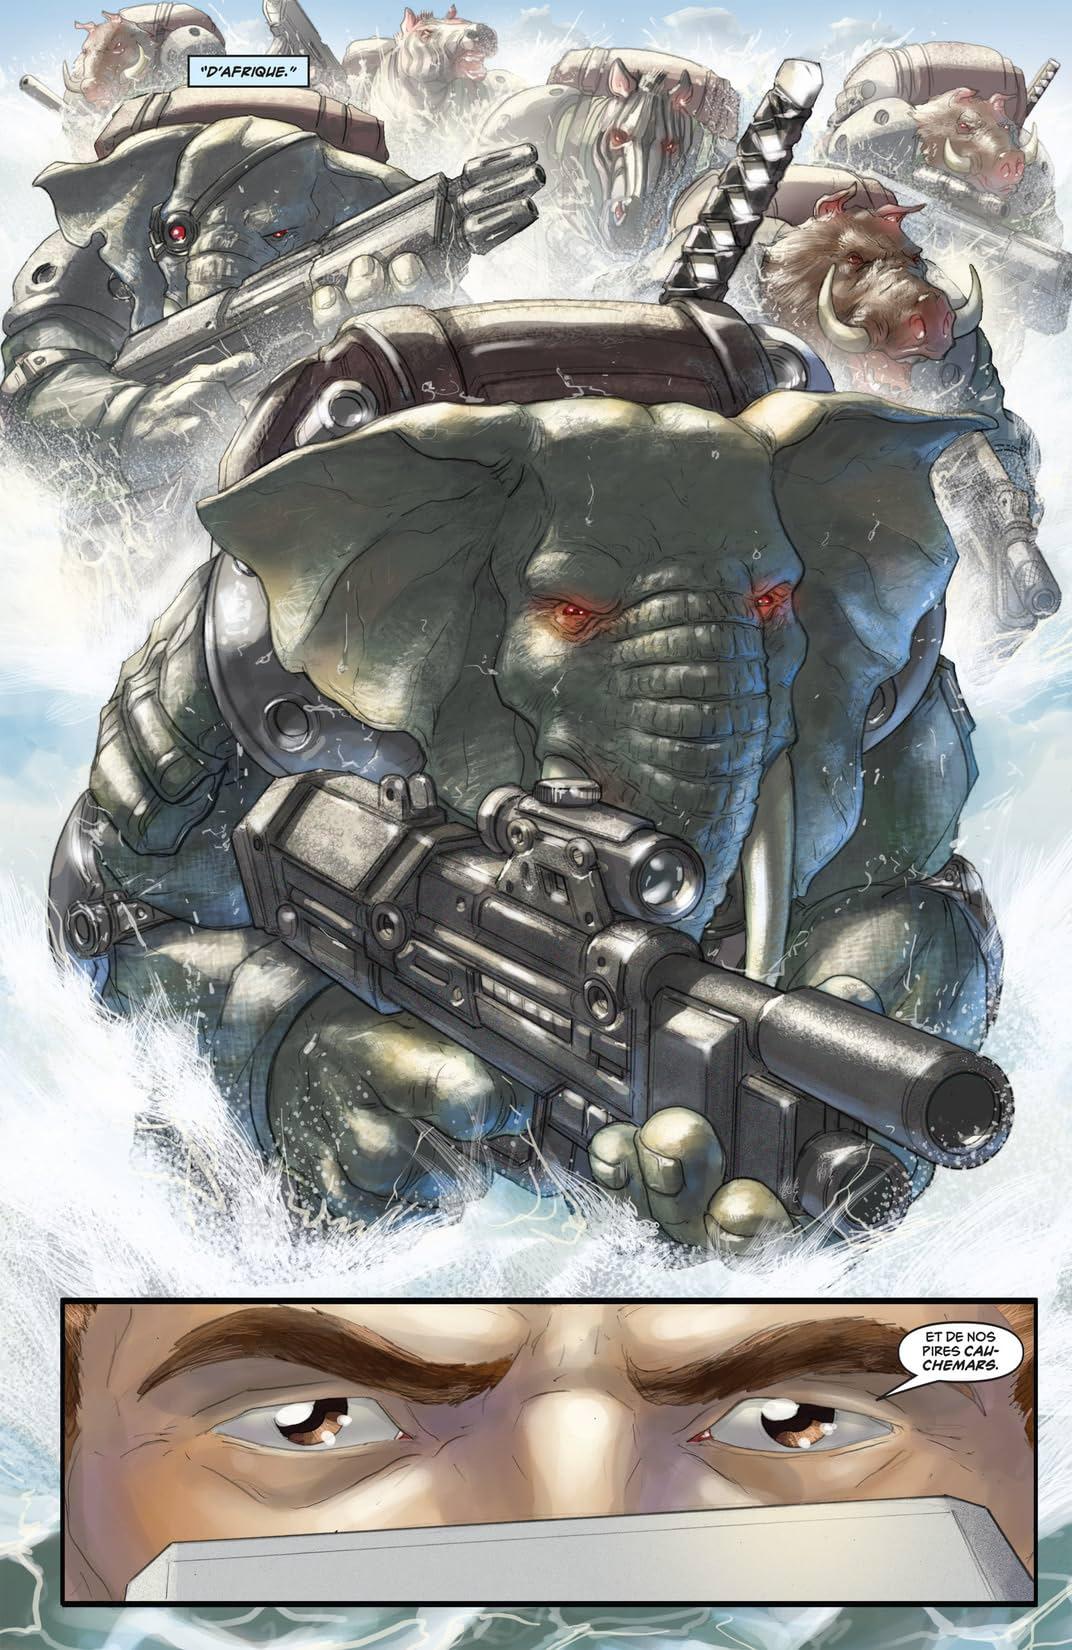 Elephantmen Vol. 1: Jouets de guerre